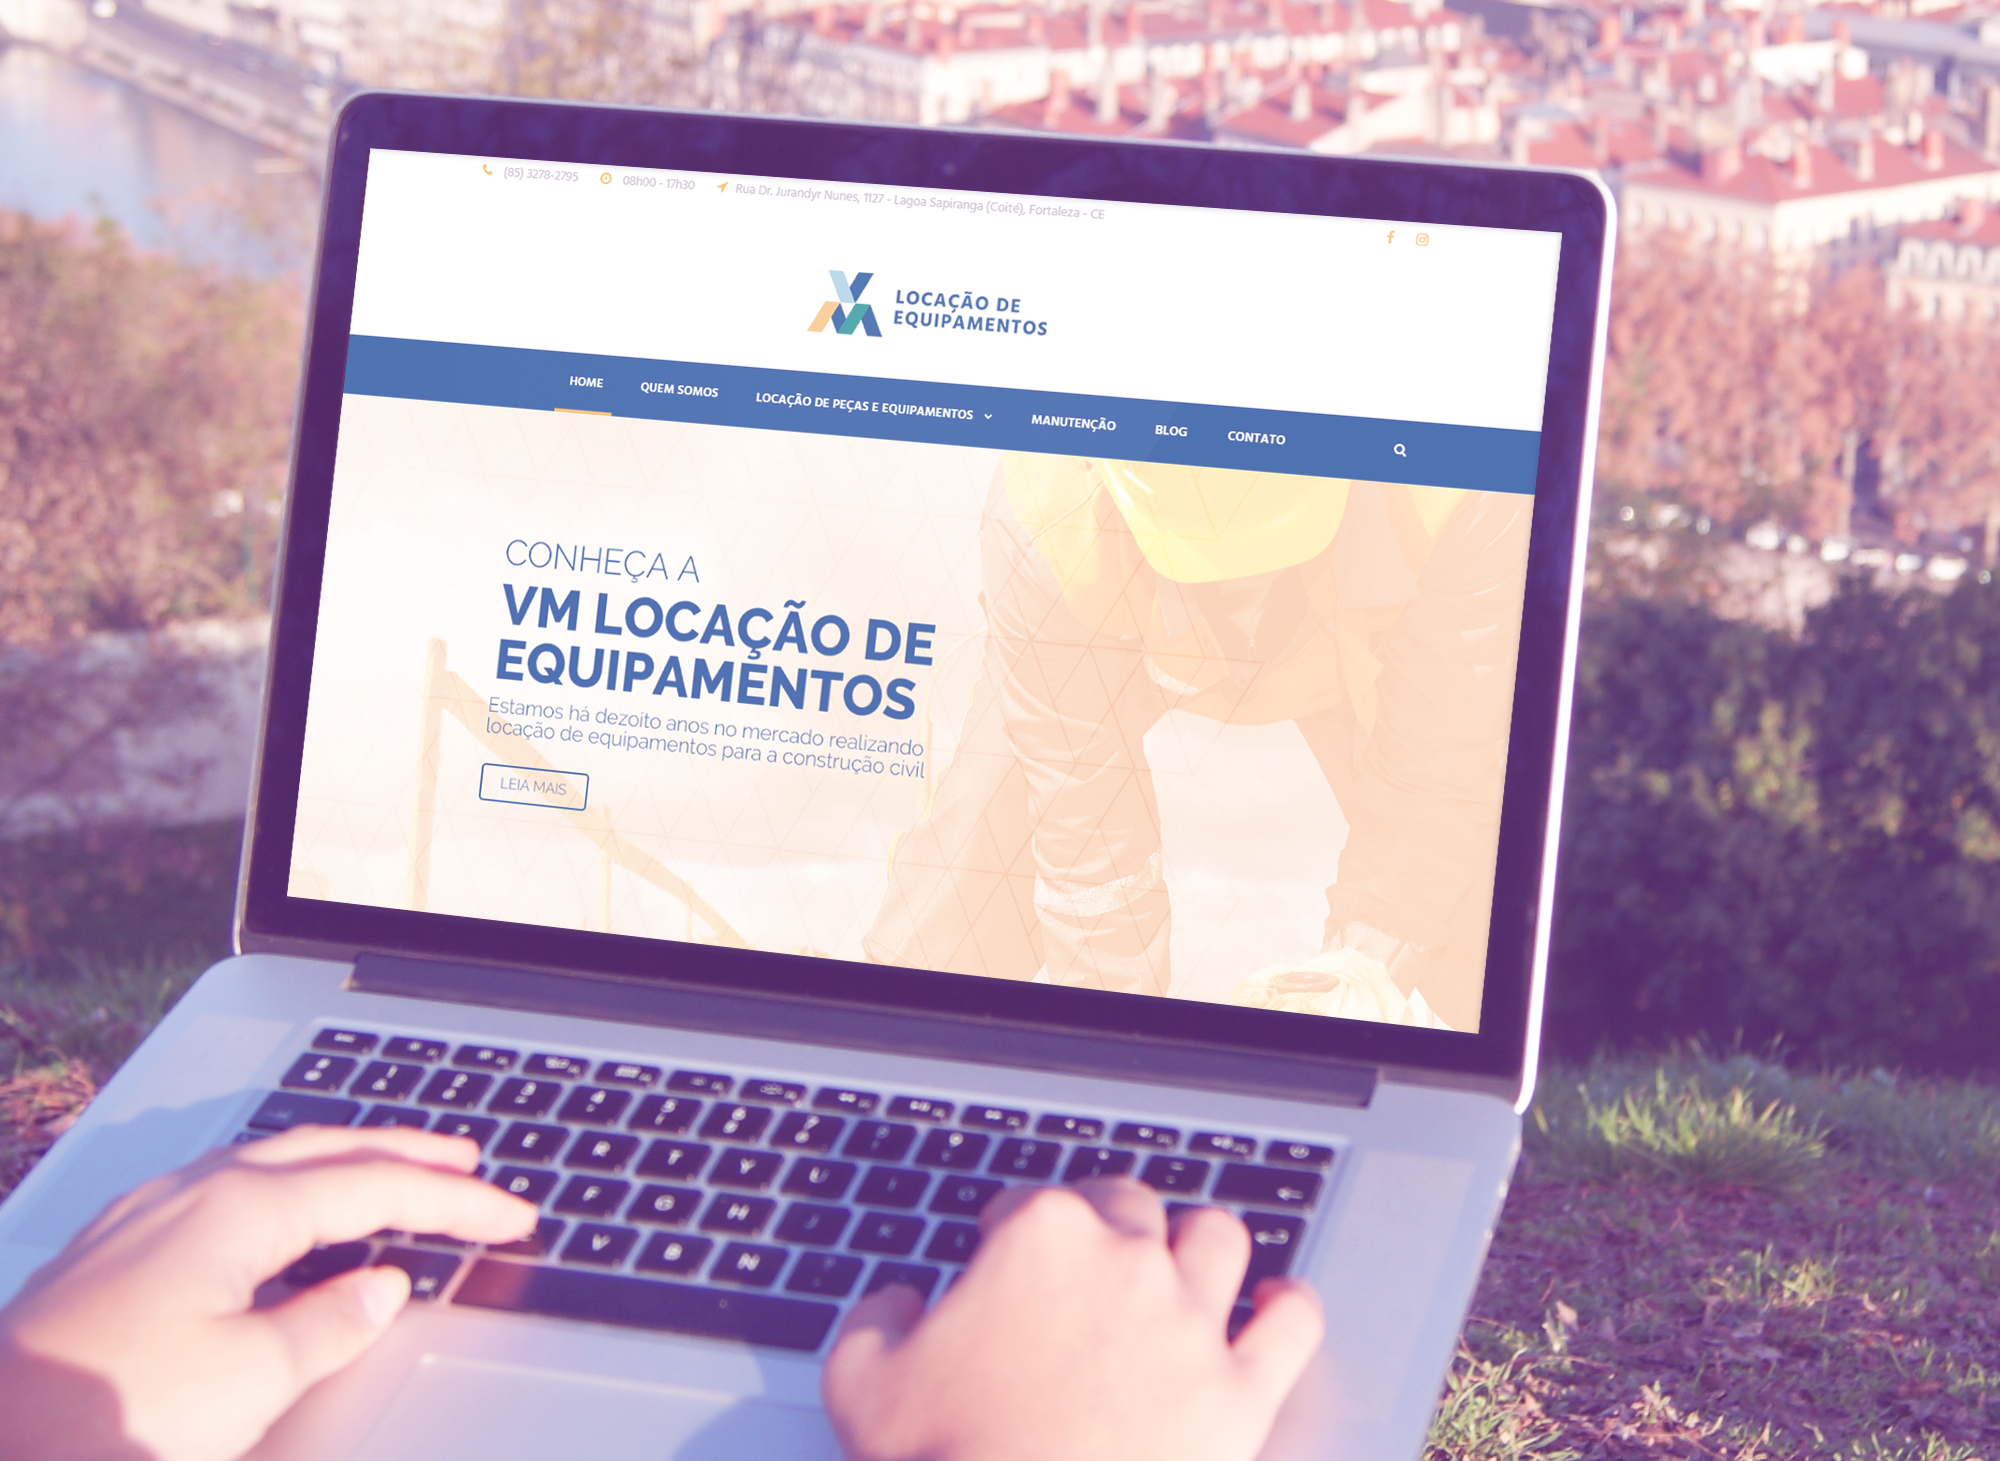 site-vm-locacao-de-equipamentos-portfolio-agencia-diretriz-digital-marketing-fortaleza1